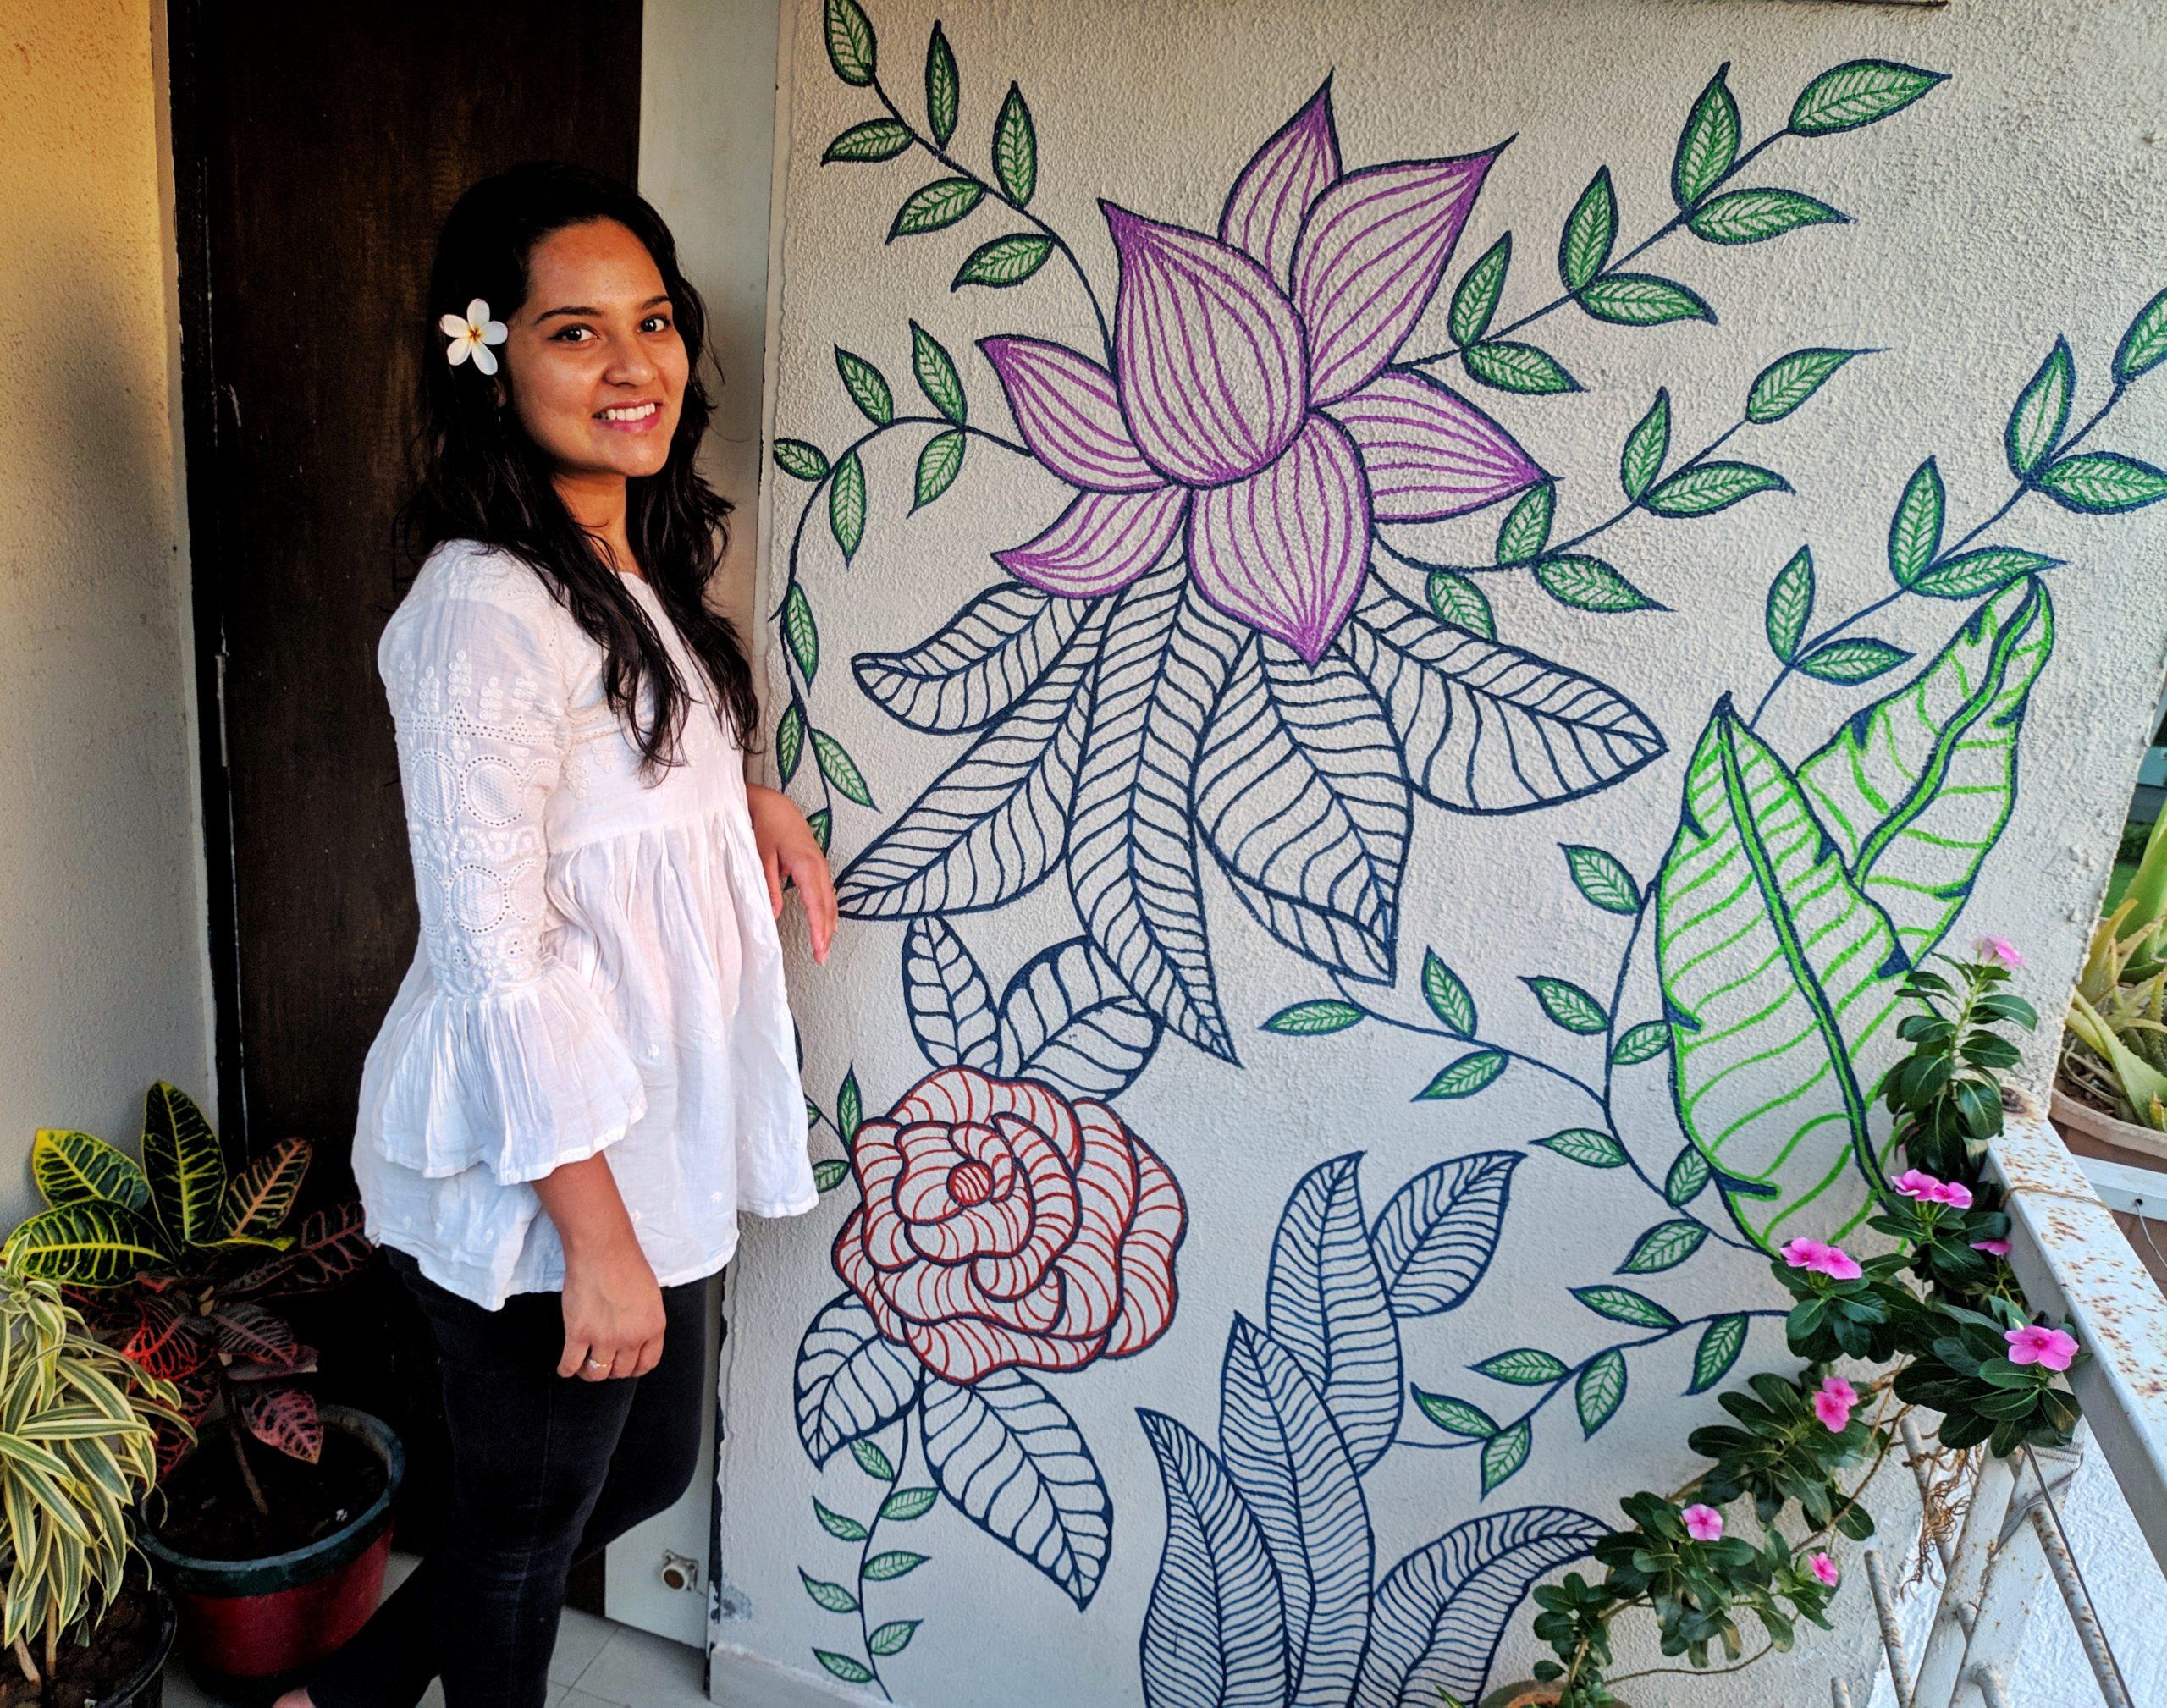 Nidhi Yayati Desai